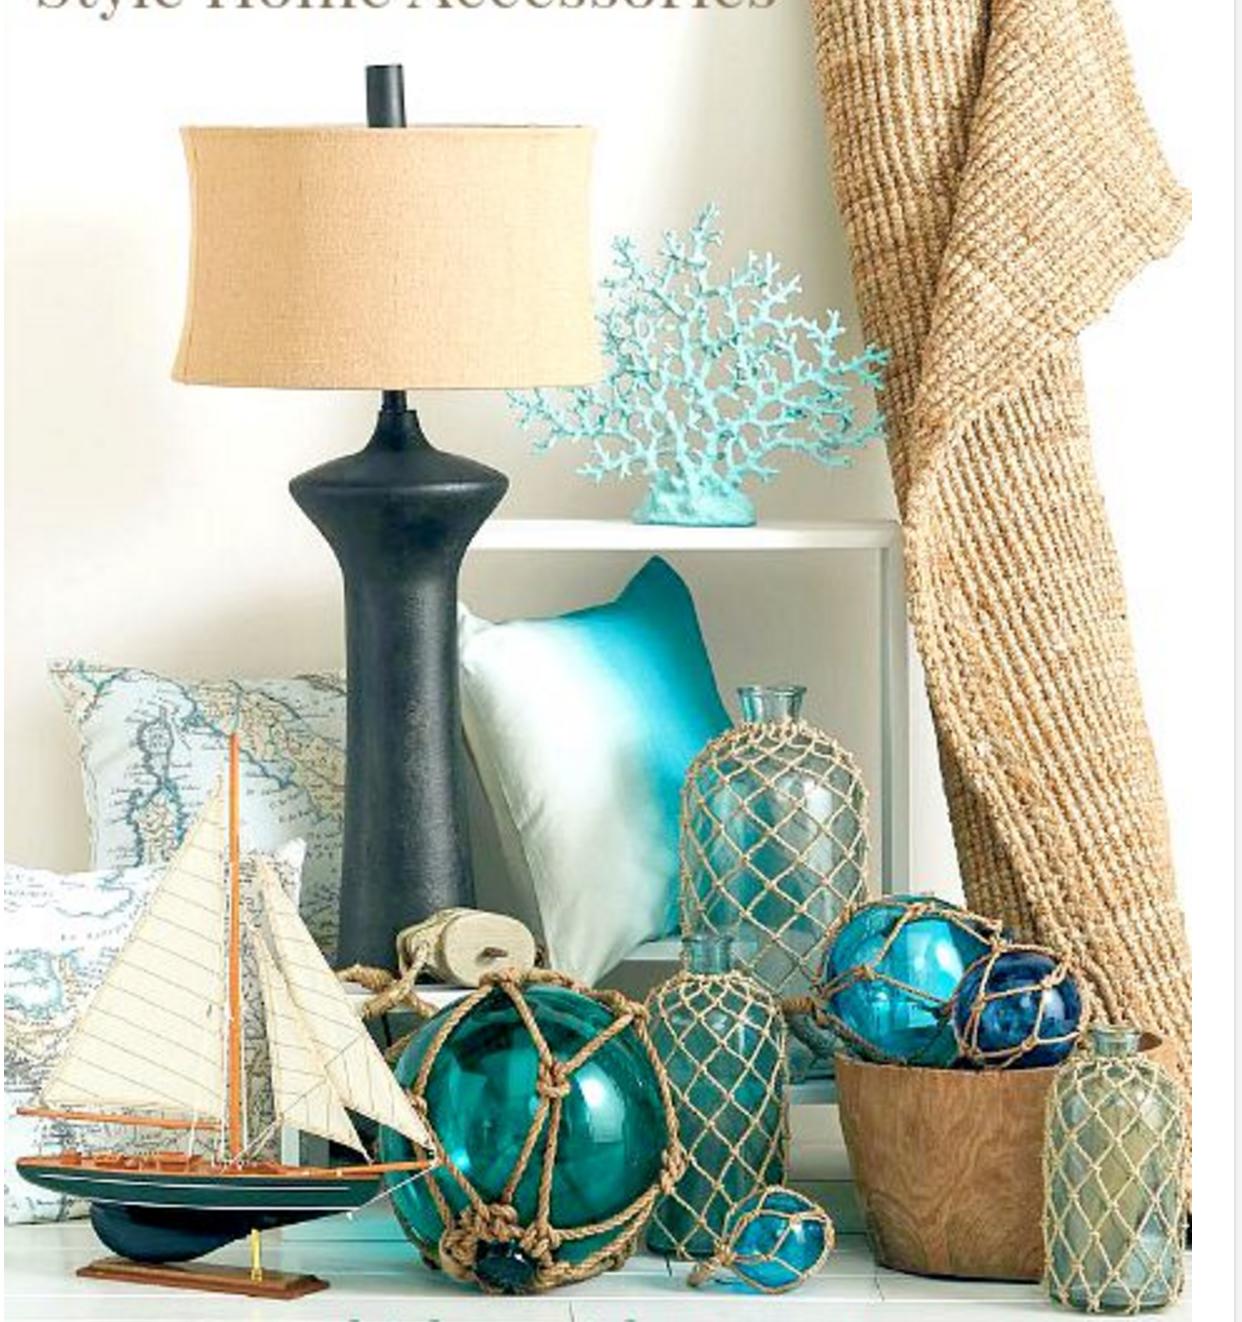 Coastal Home Decor Accessories: Pin By Christina Engelbart On Home Dec Theme